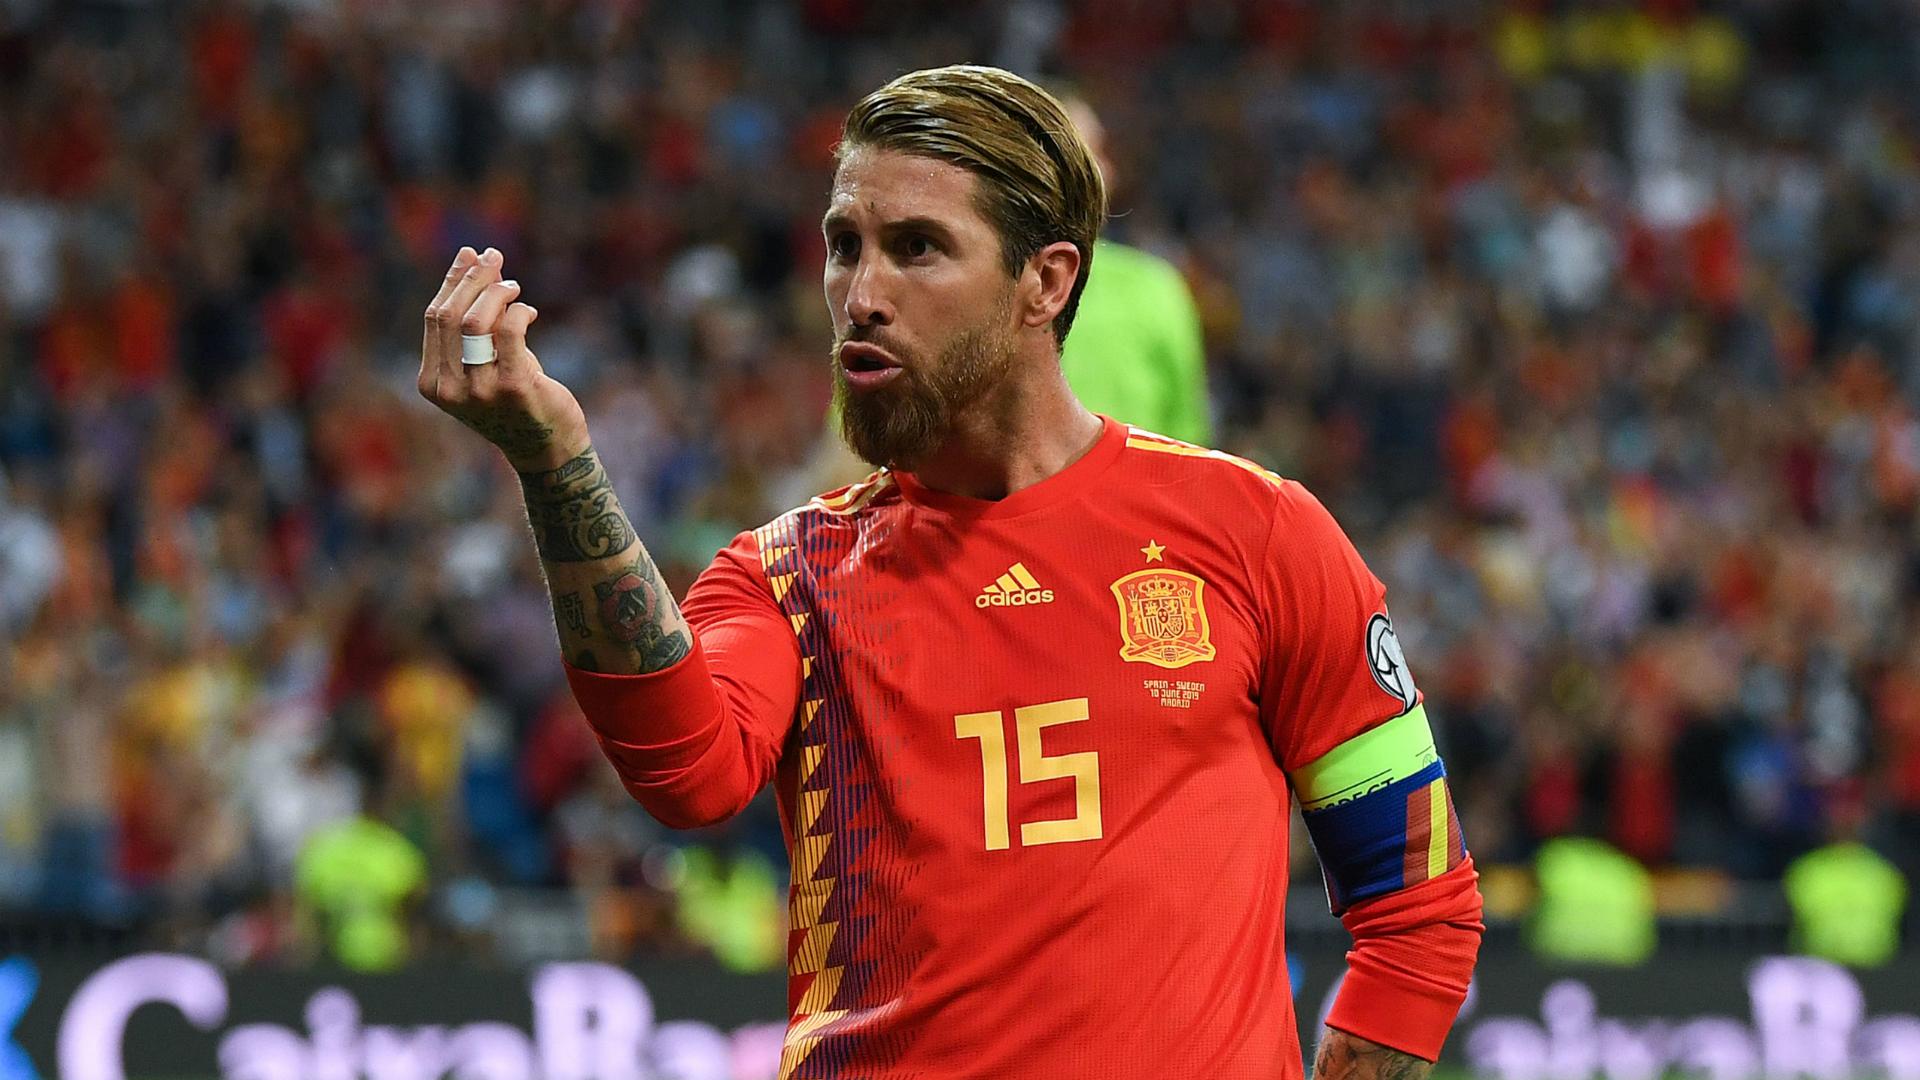 Tokyo gold dream shows Ramos is still ambitious - Moreno